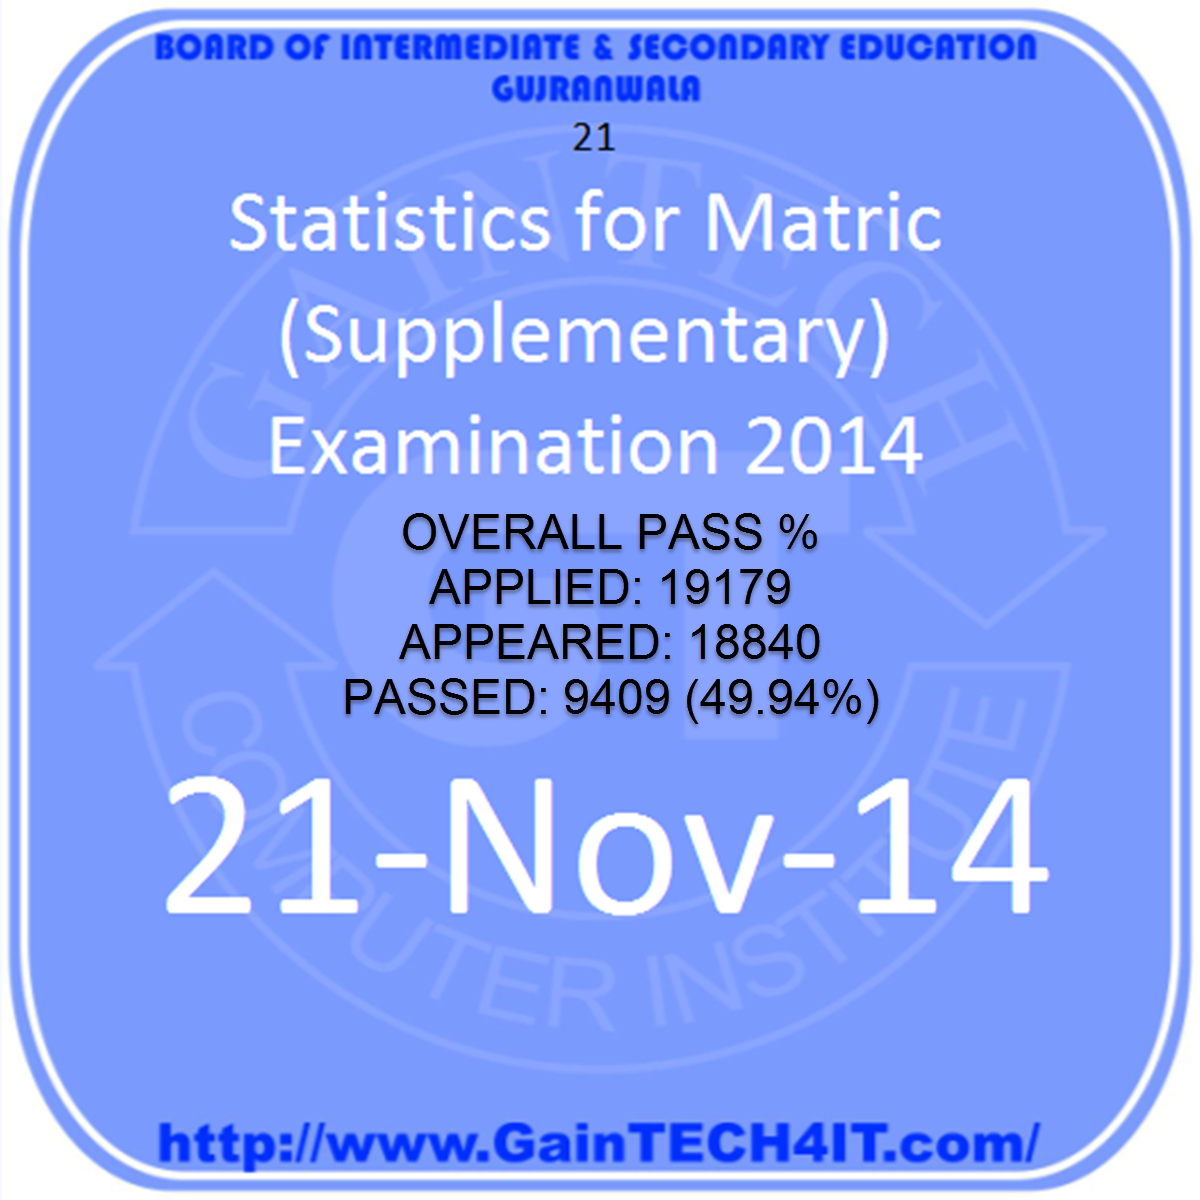 gujranwala board result statistics